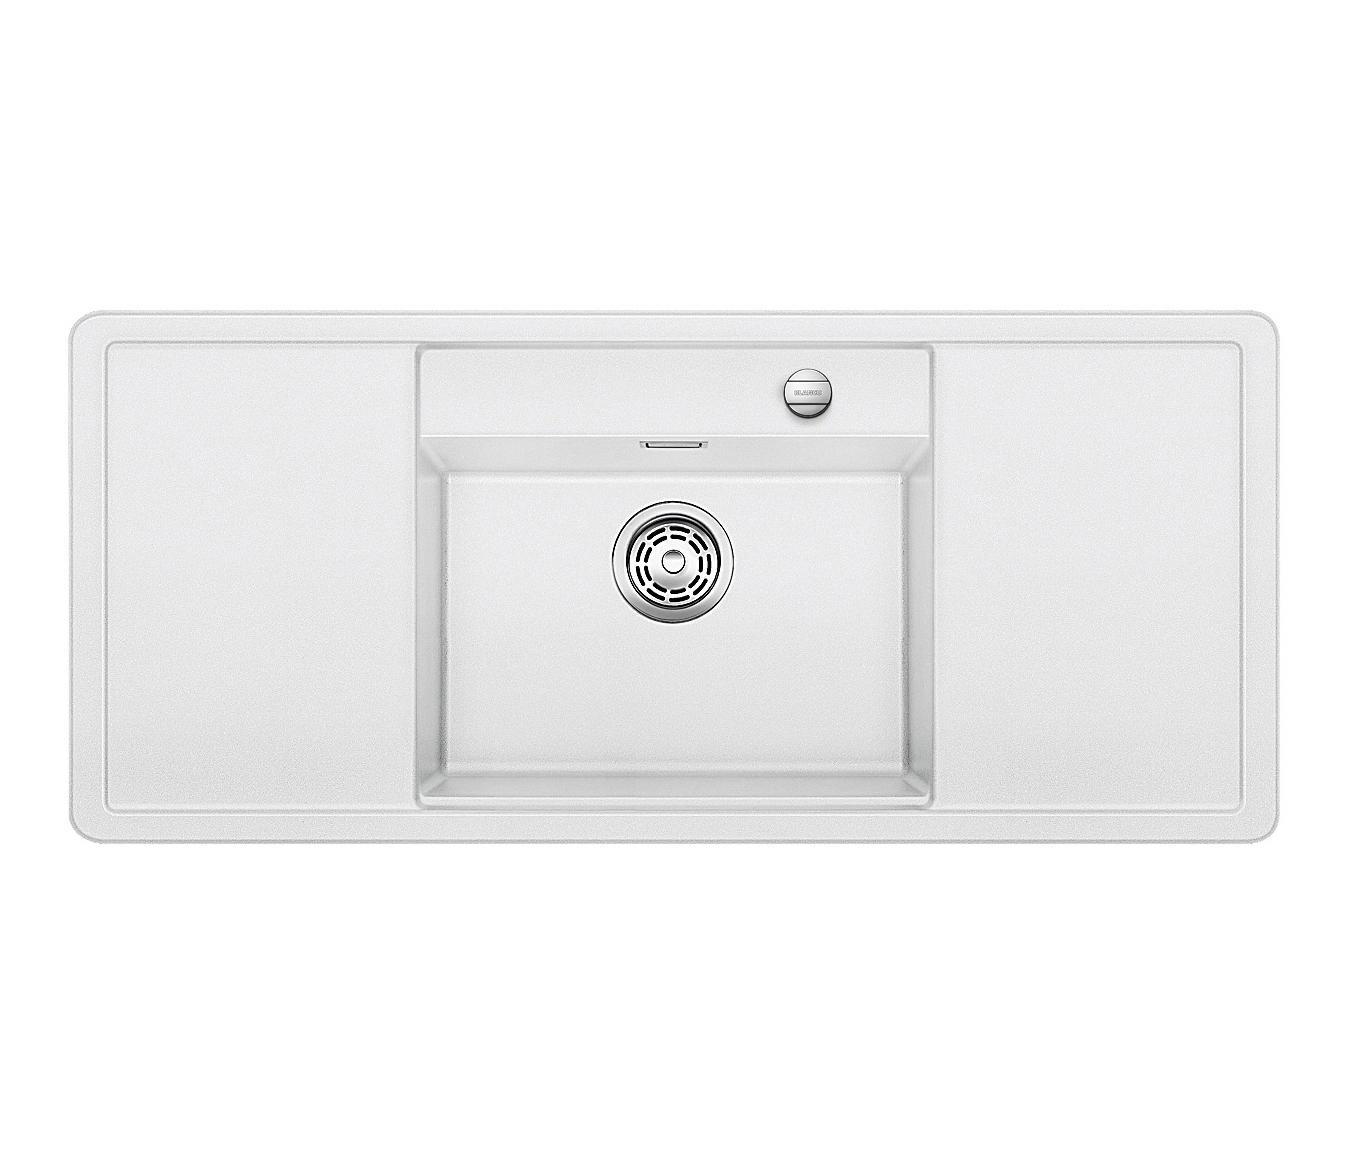 Blanco Silgranit White : BLANCO ALAROS 6 S SILGRANIT White - Kitchen sinks by Blanco ...